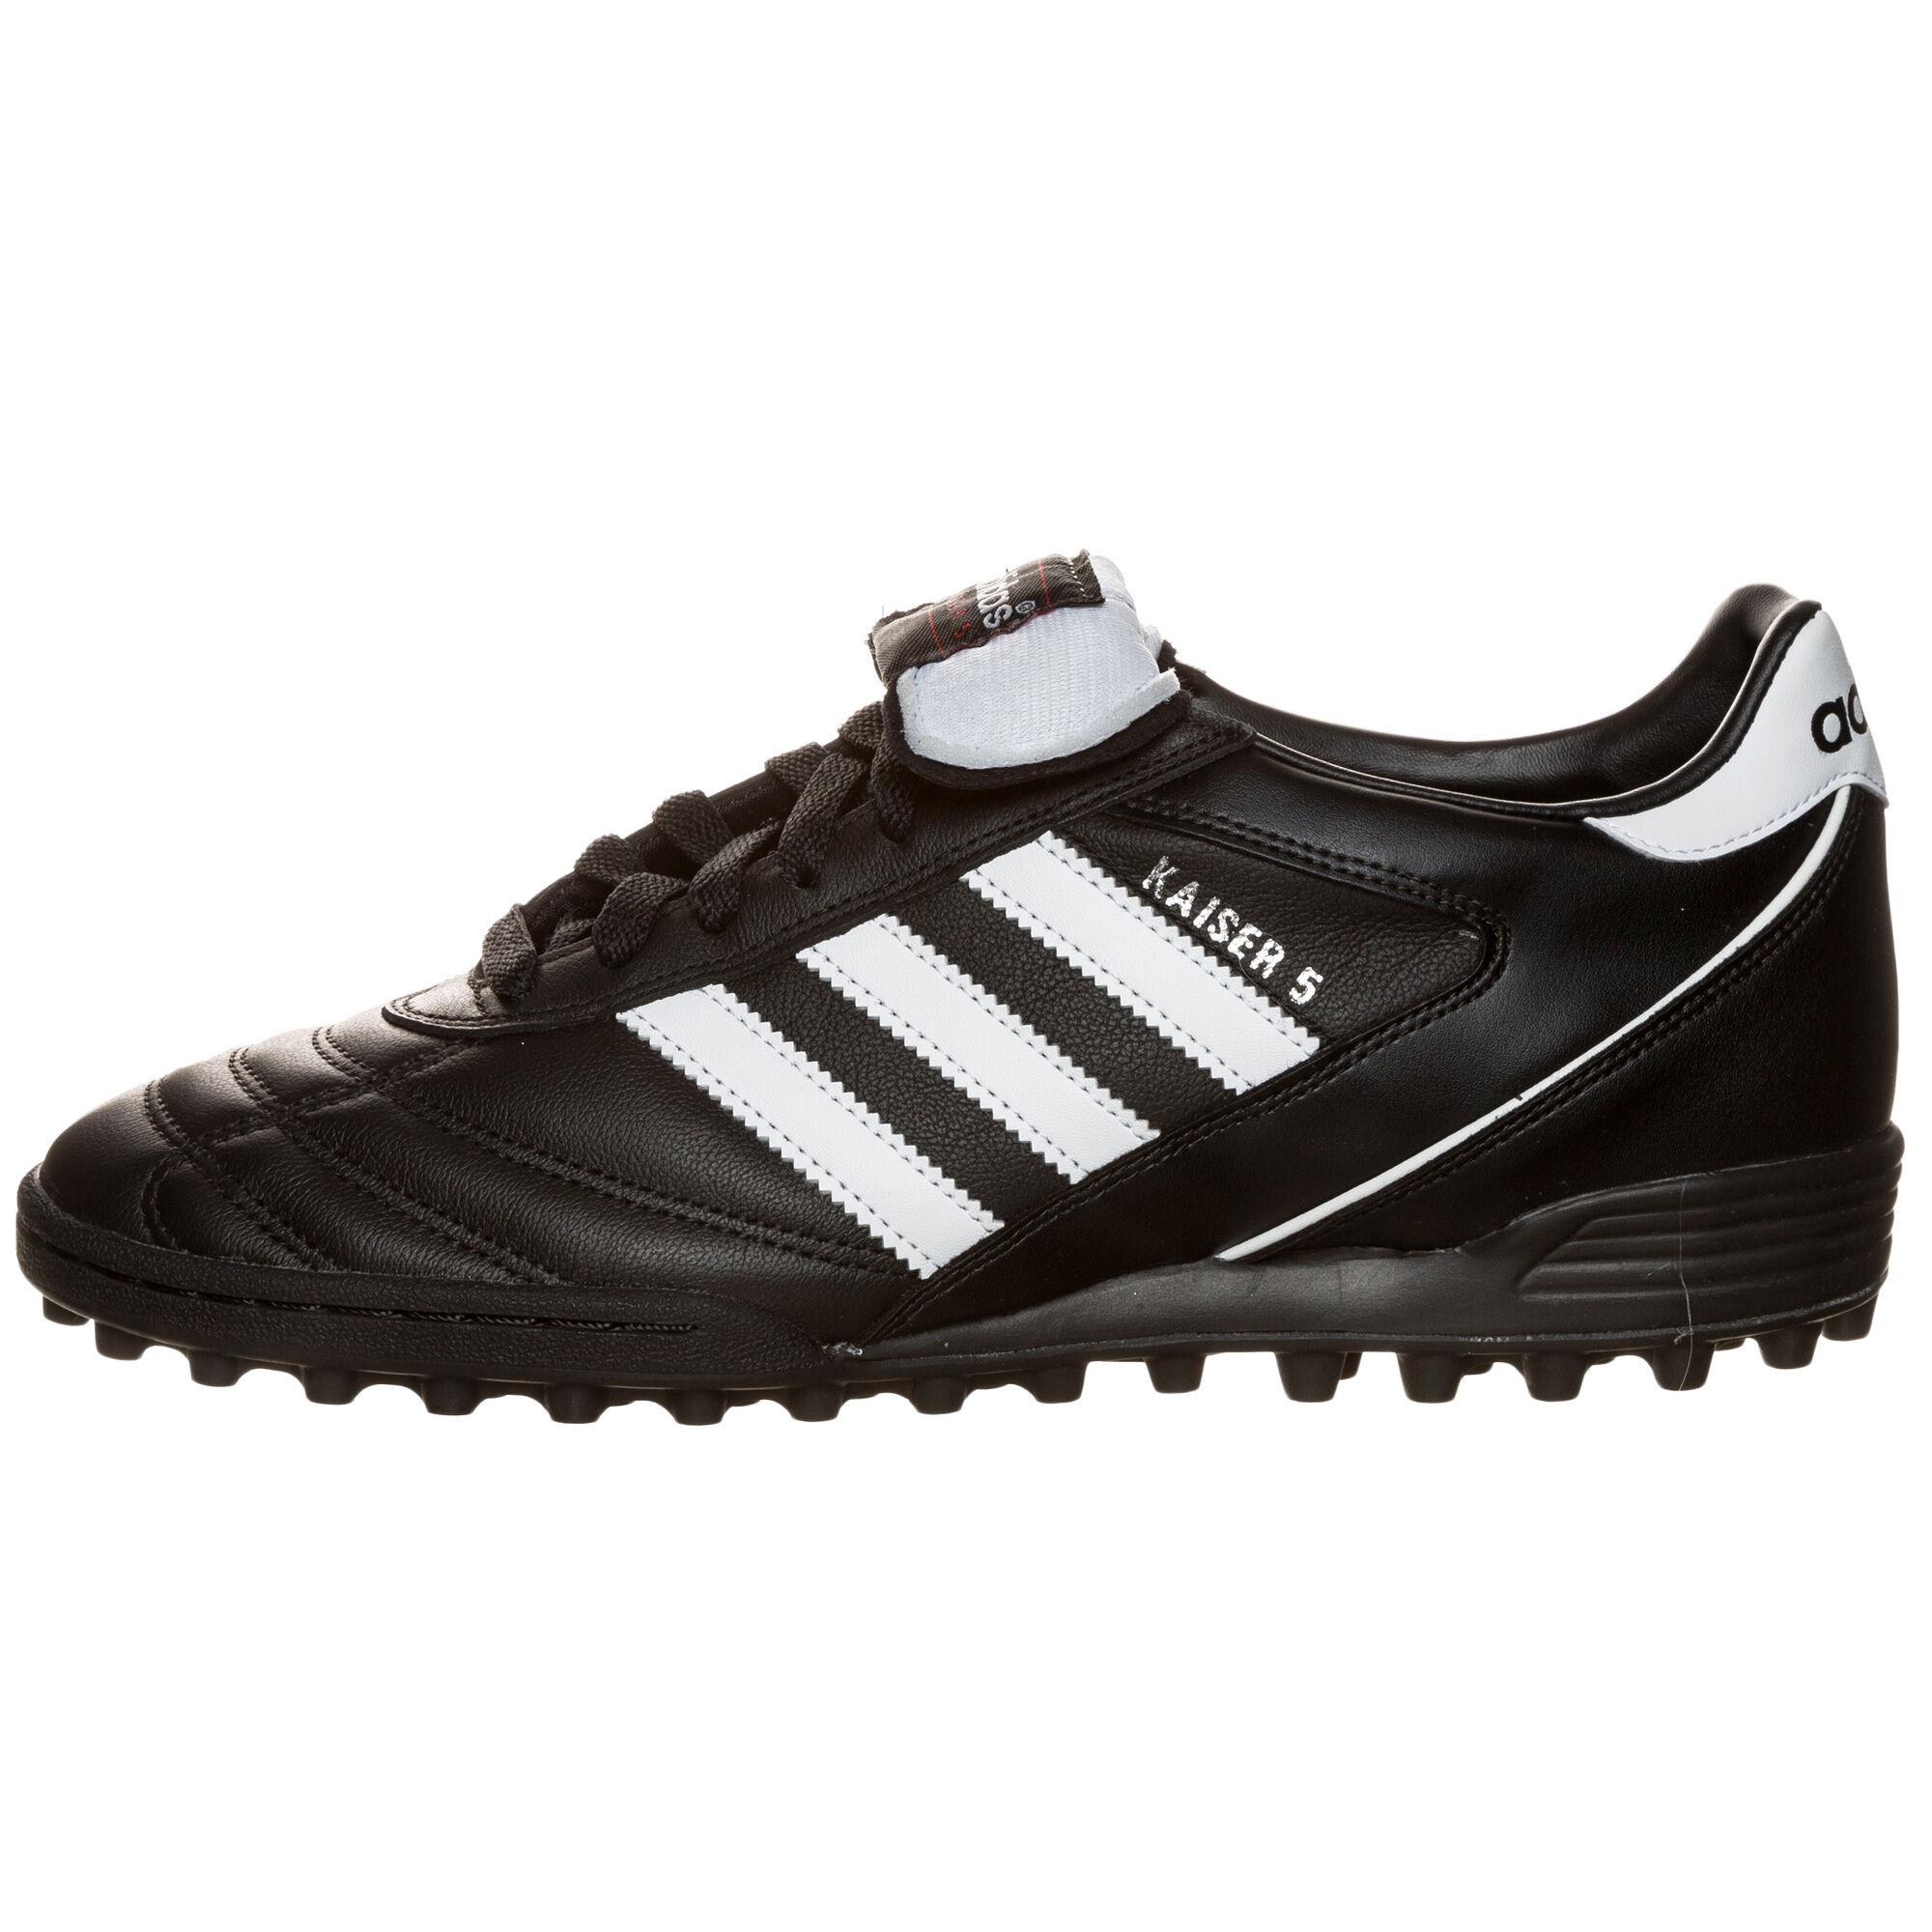 Bei Adidas Performance Kaiser Fußballschuh Outfitter Team Herren 5 hQdCtsr